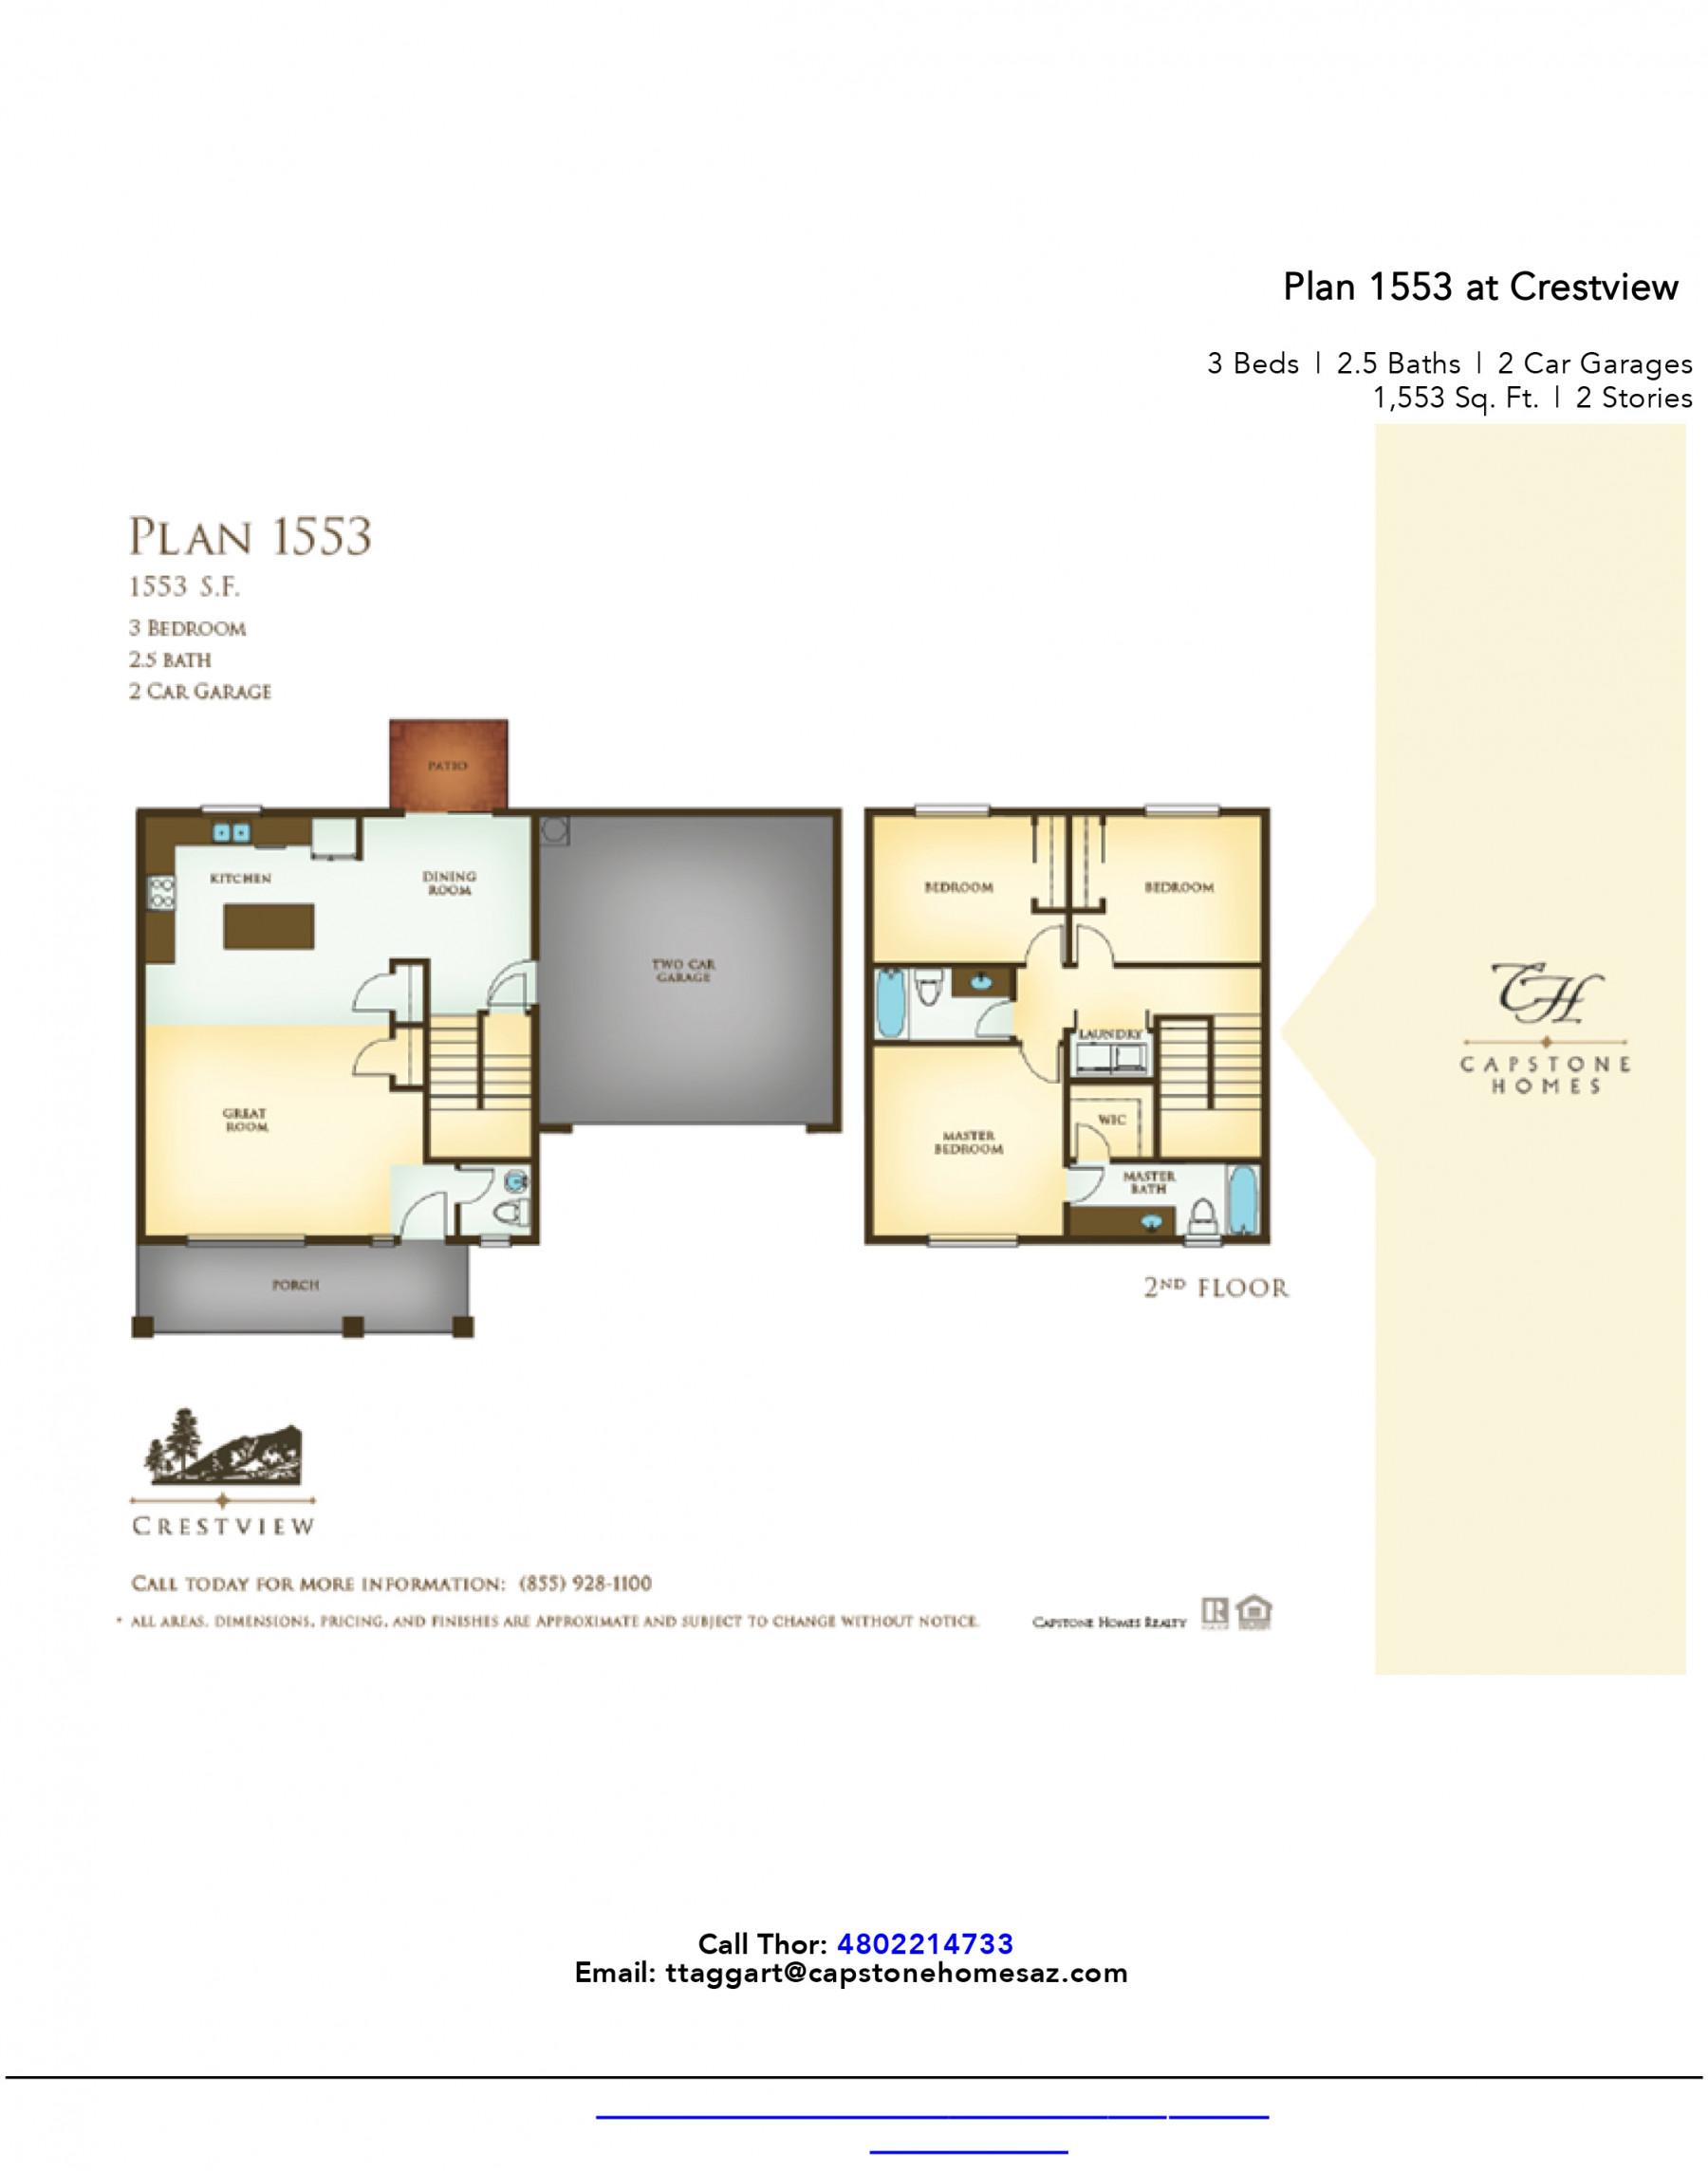 Crestview Plan 1553